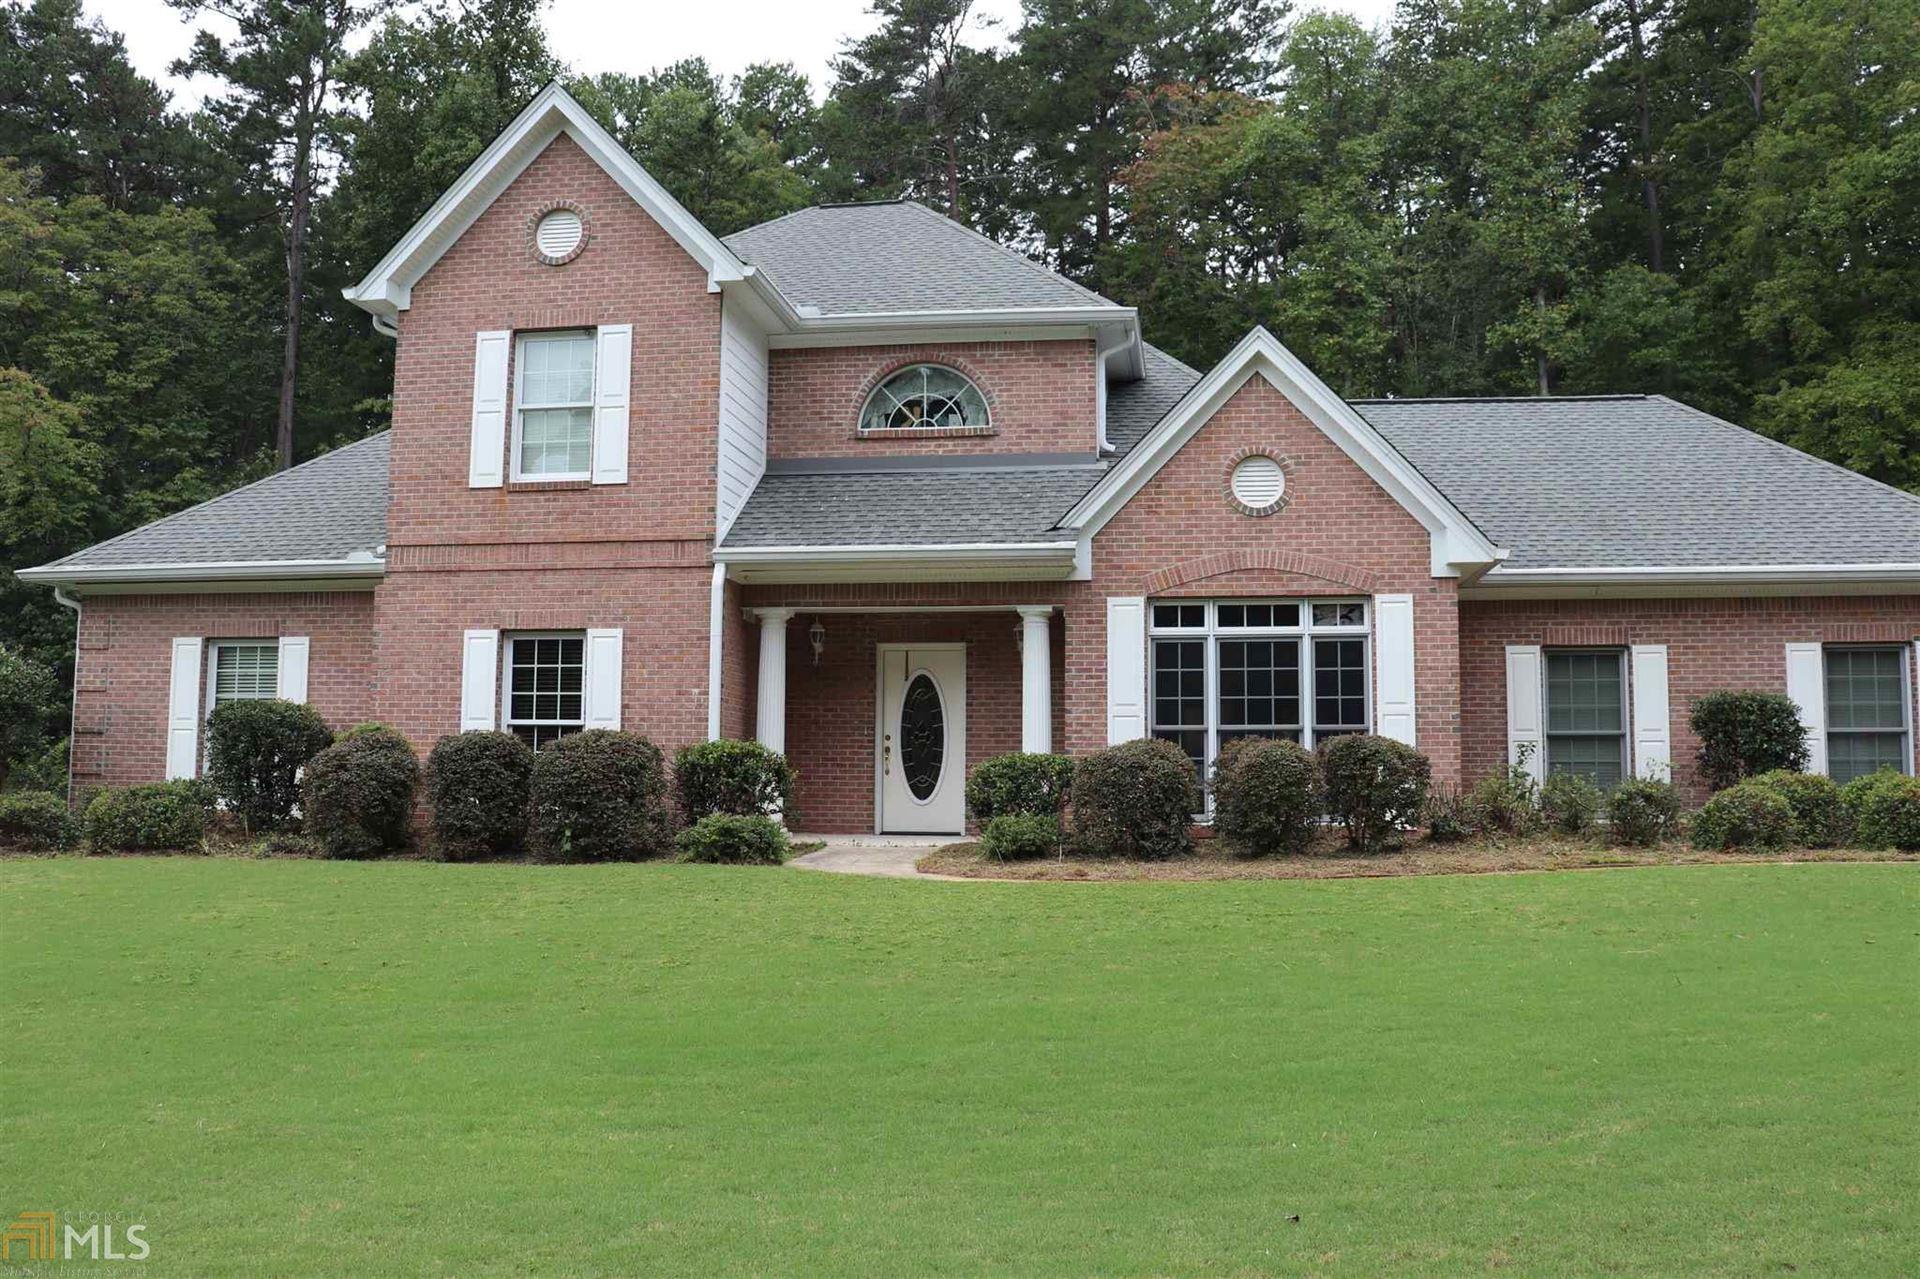 270 Orchard Creek Dr, Clarkesville, GA 30523 - MLS#: 8863734